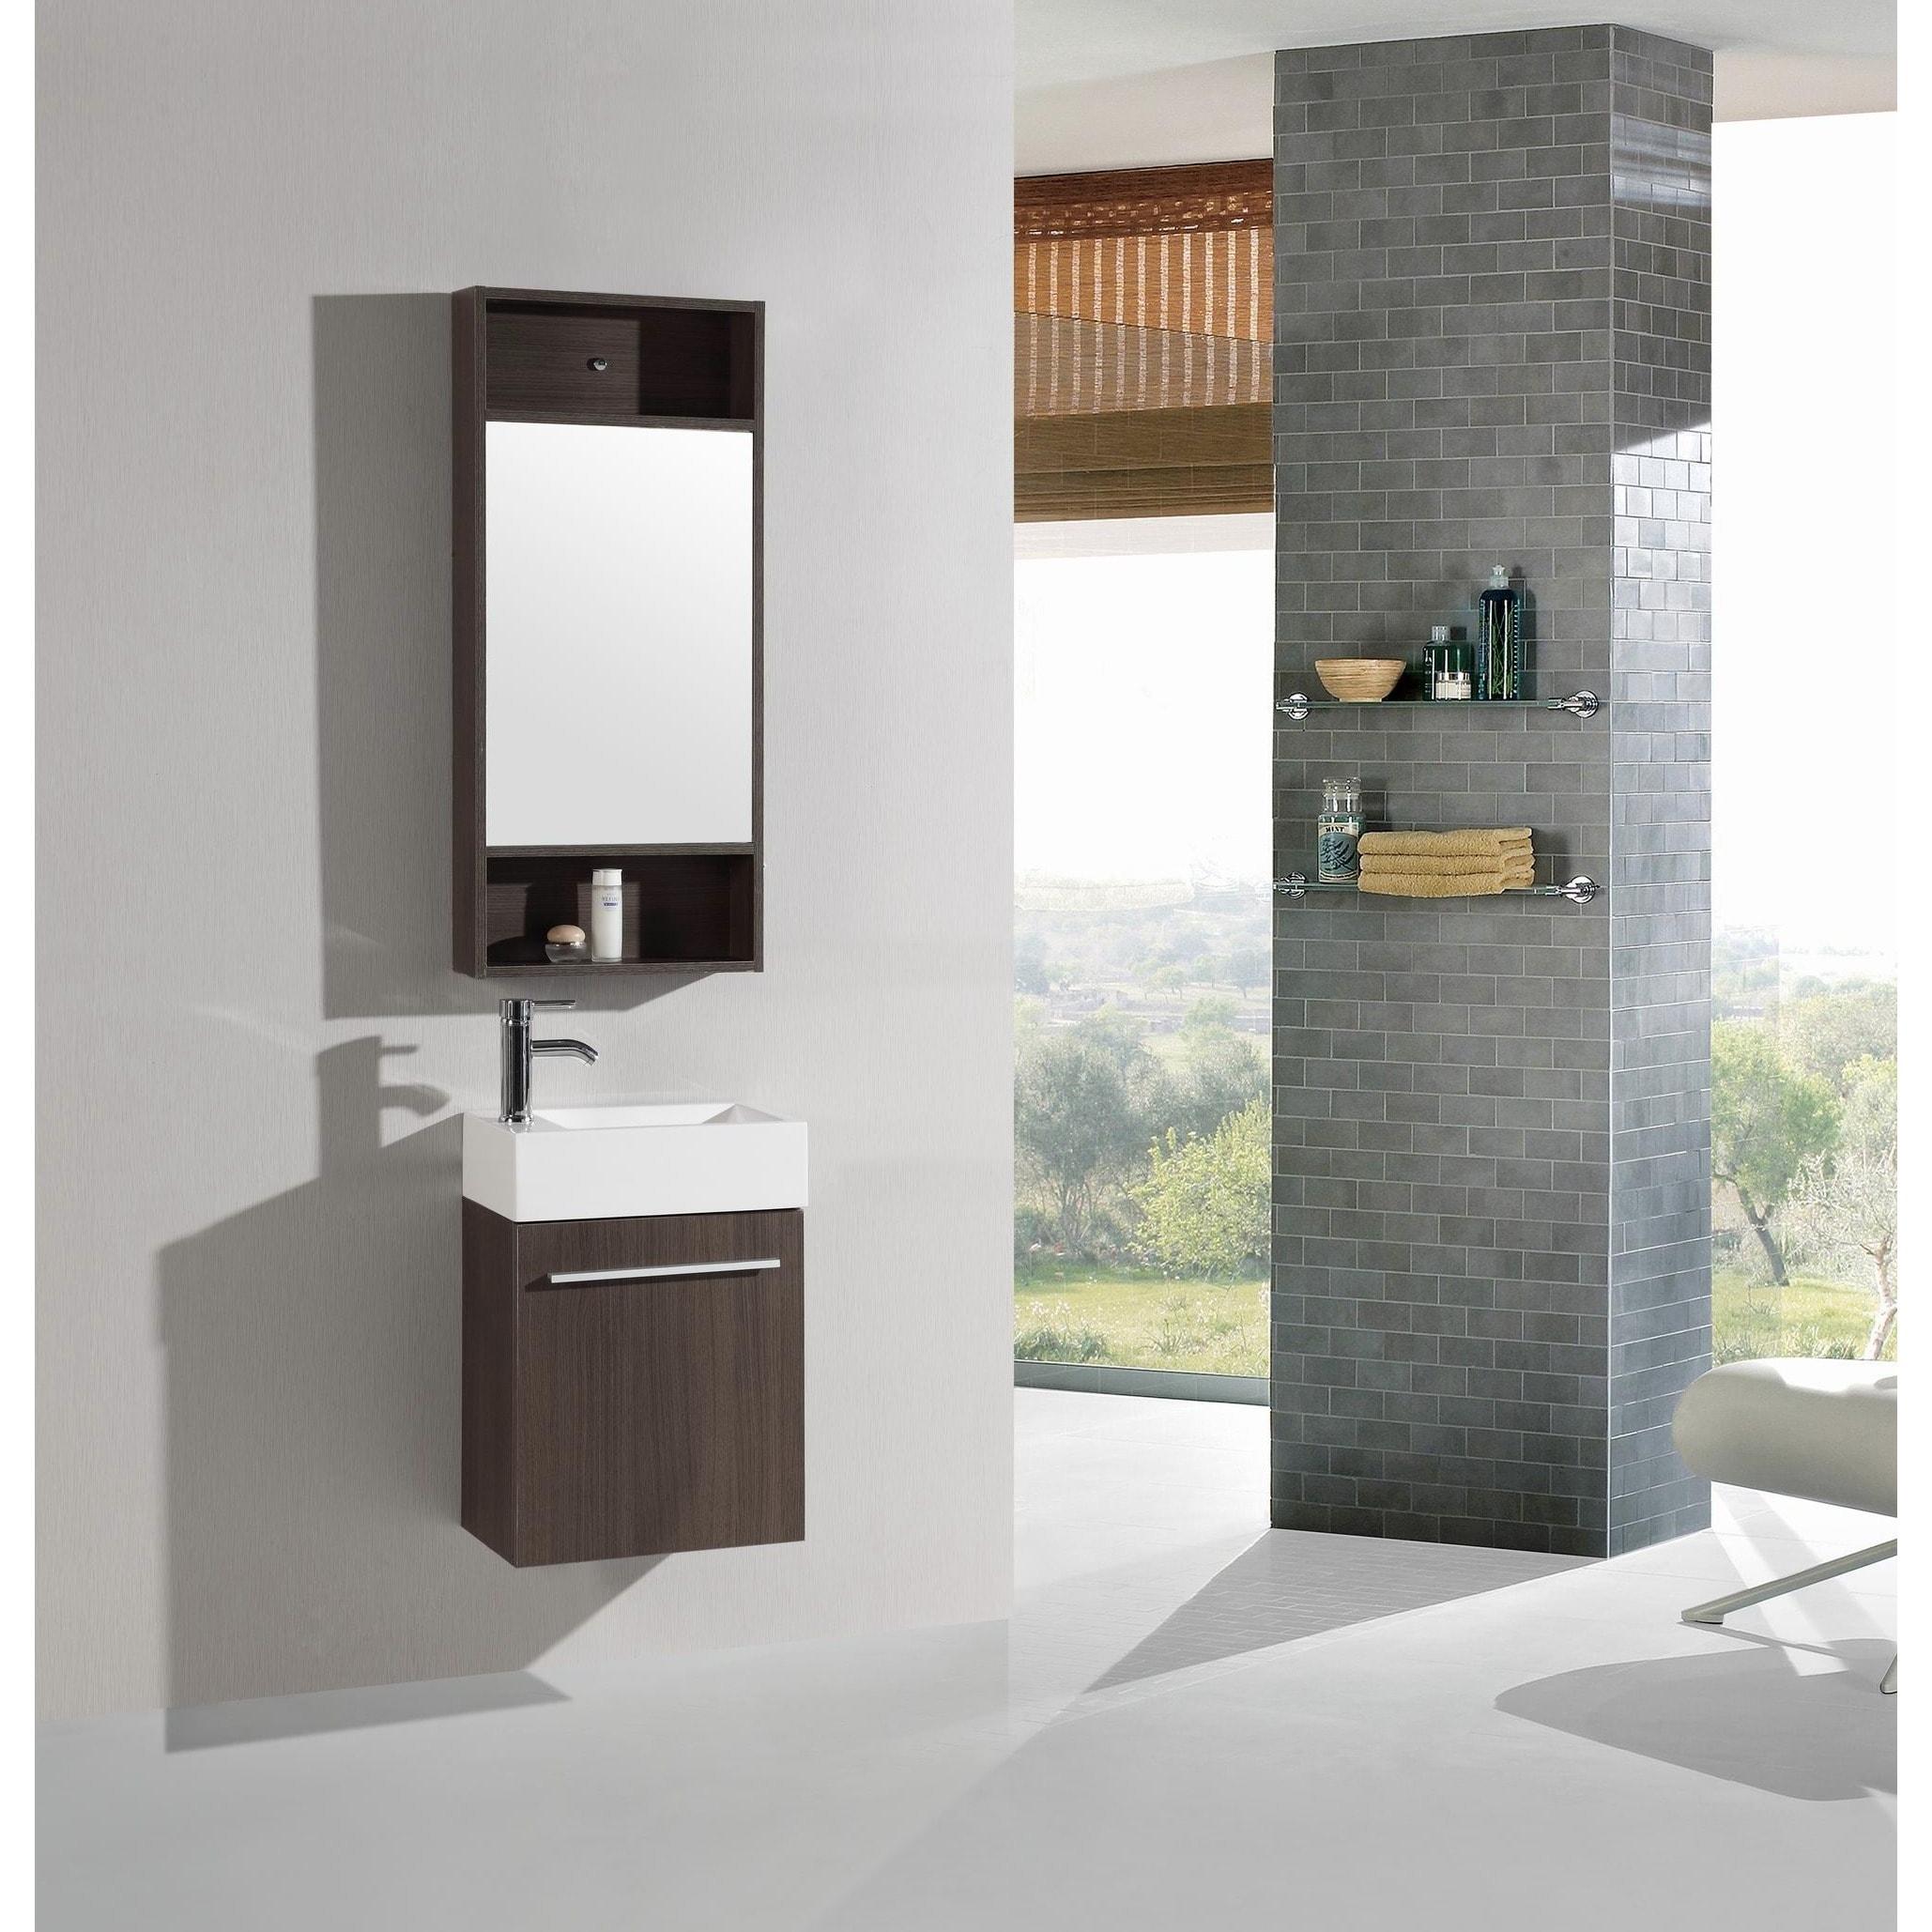 Shop 18 Inch Belvedere Modern Wall Mounted Espresso Bathroom